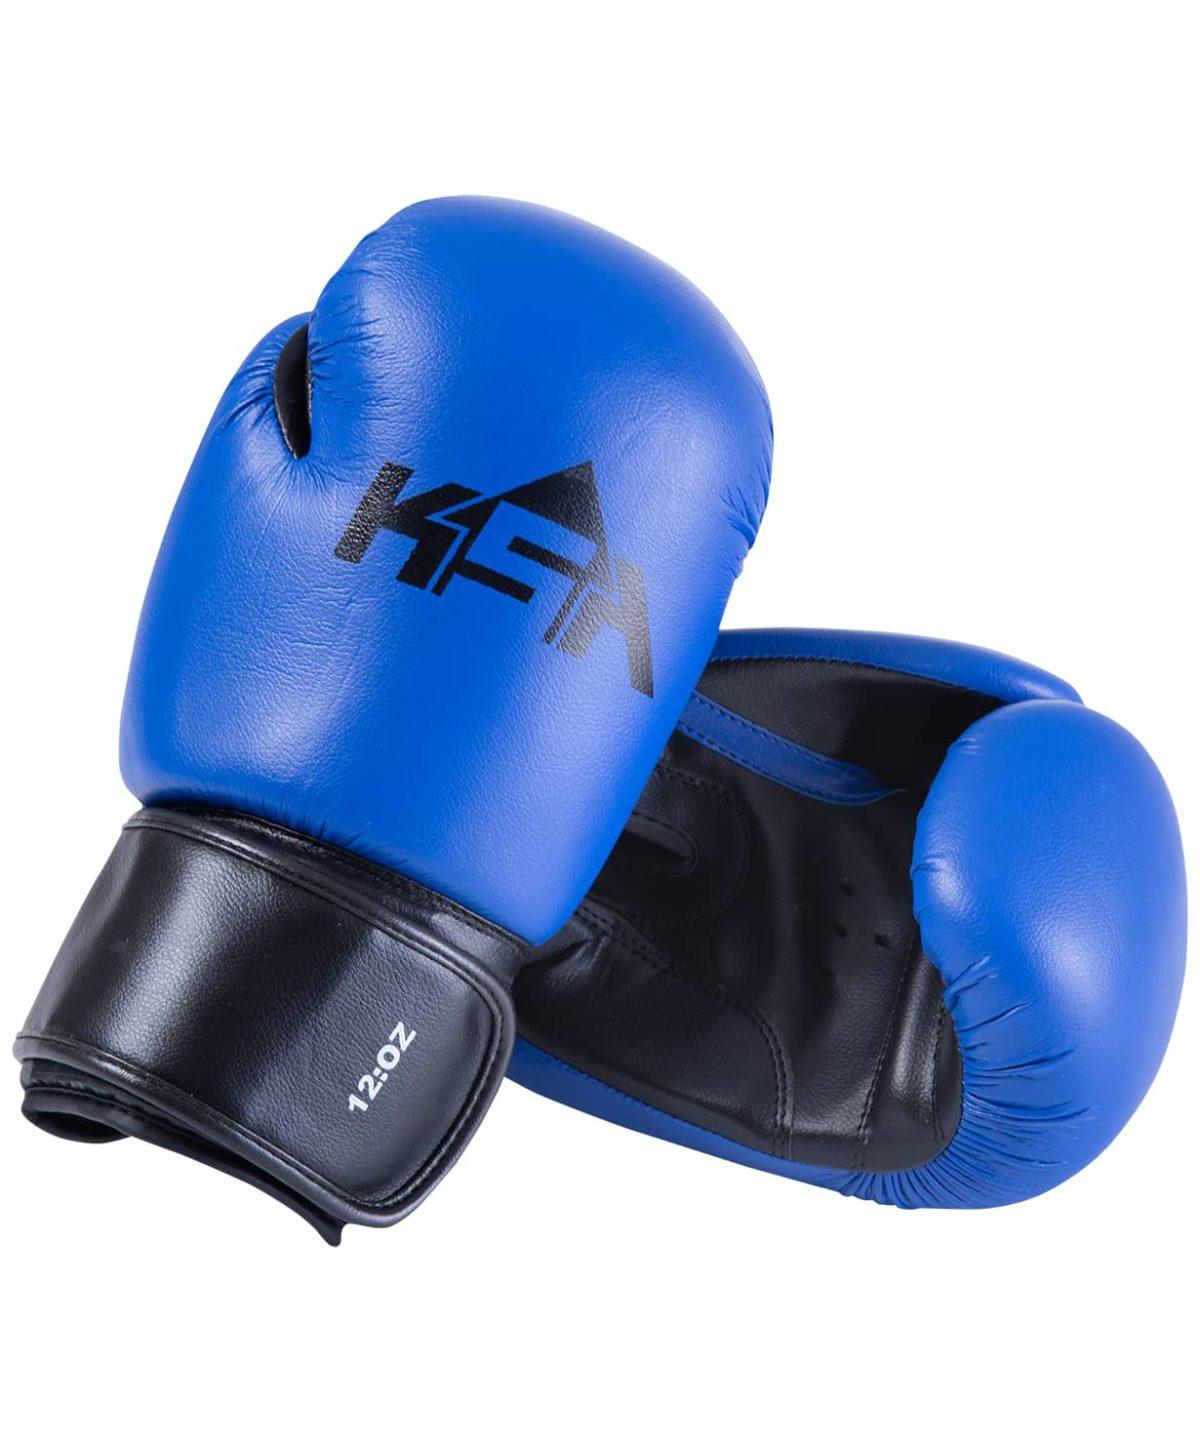 KSA Spider Red Перчатки боксерские, 8 oz, к/з 17811: синий - 1